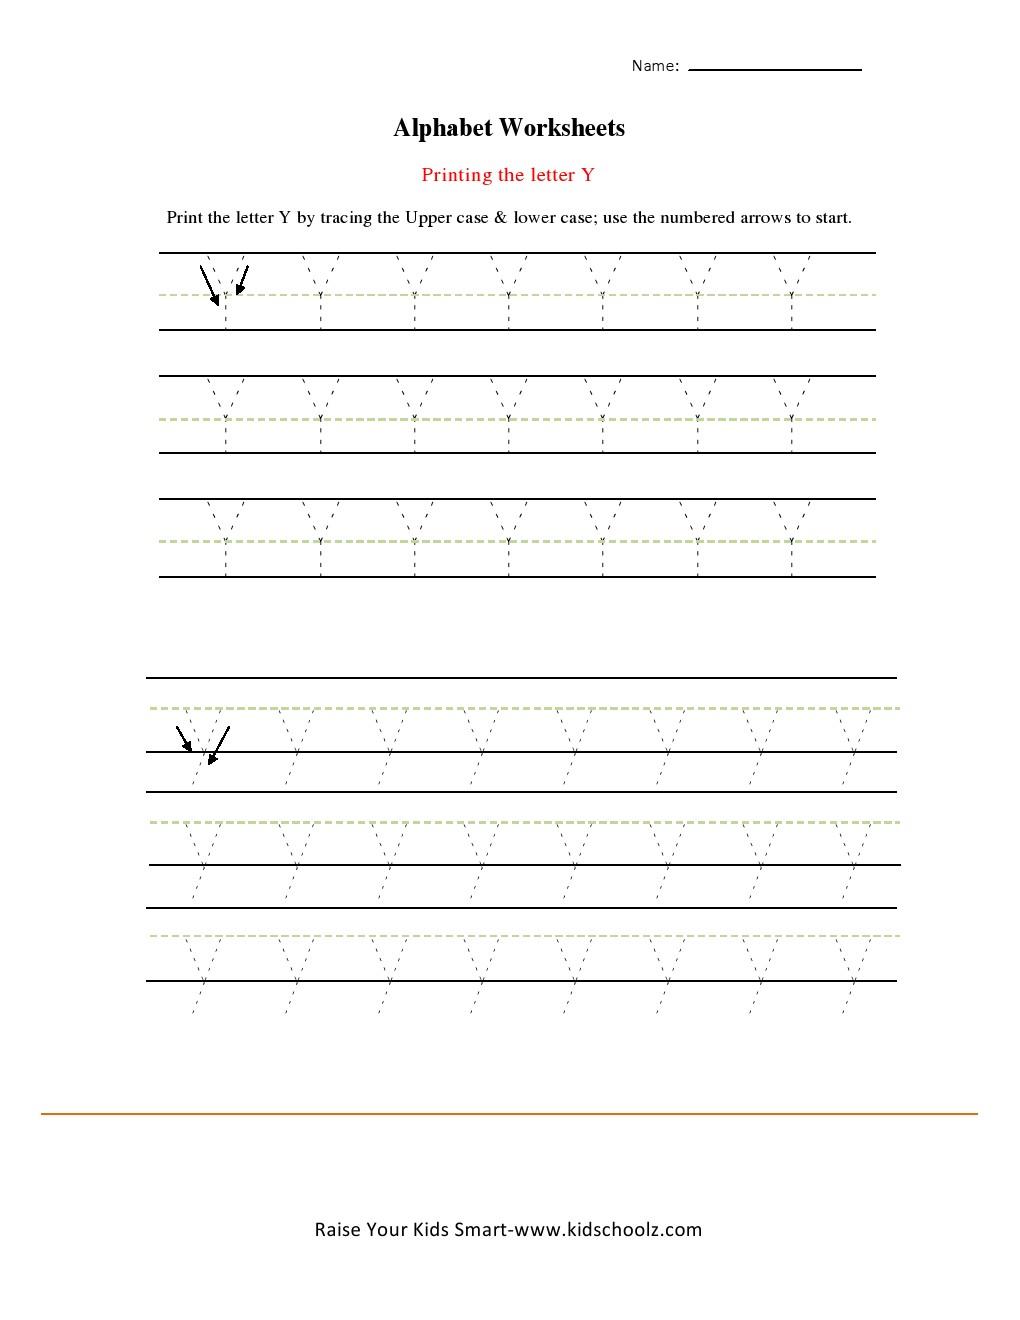 Displaying 16> Images For - Letter Y Worksheets...